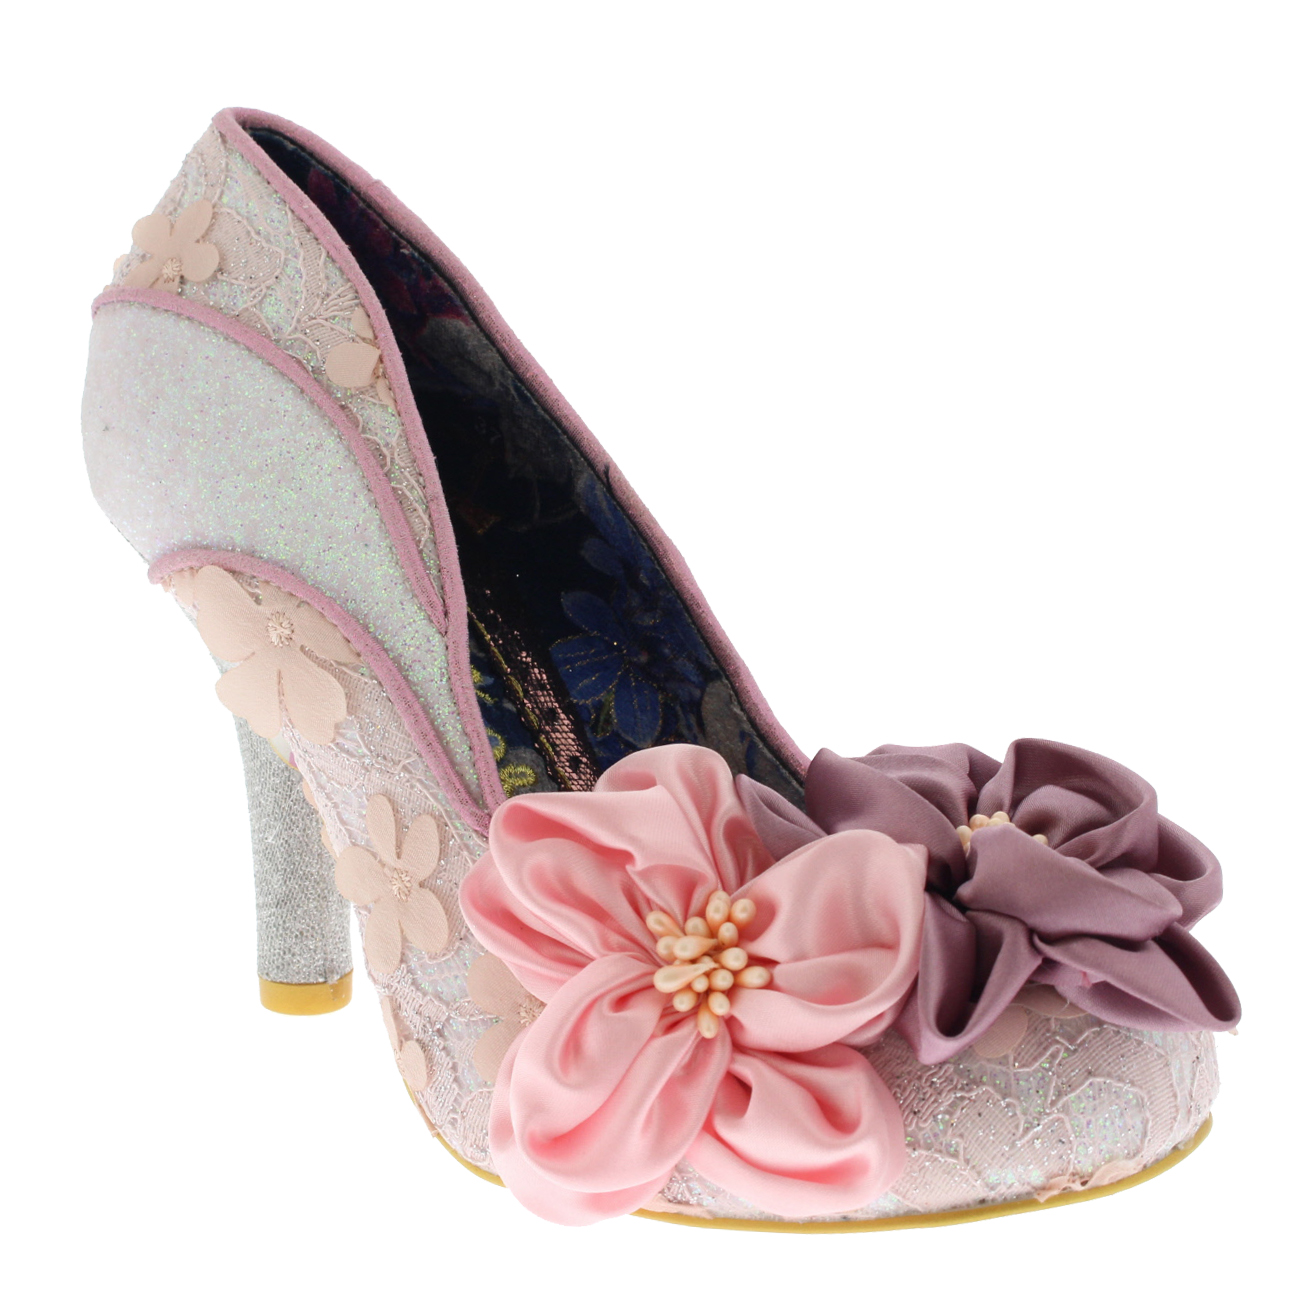 Señora irregular Choice peach melba brillo alto tribunal talón zapato zapato zapato UE 36-43 9f5f3d